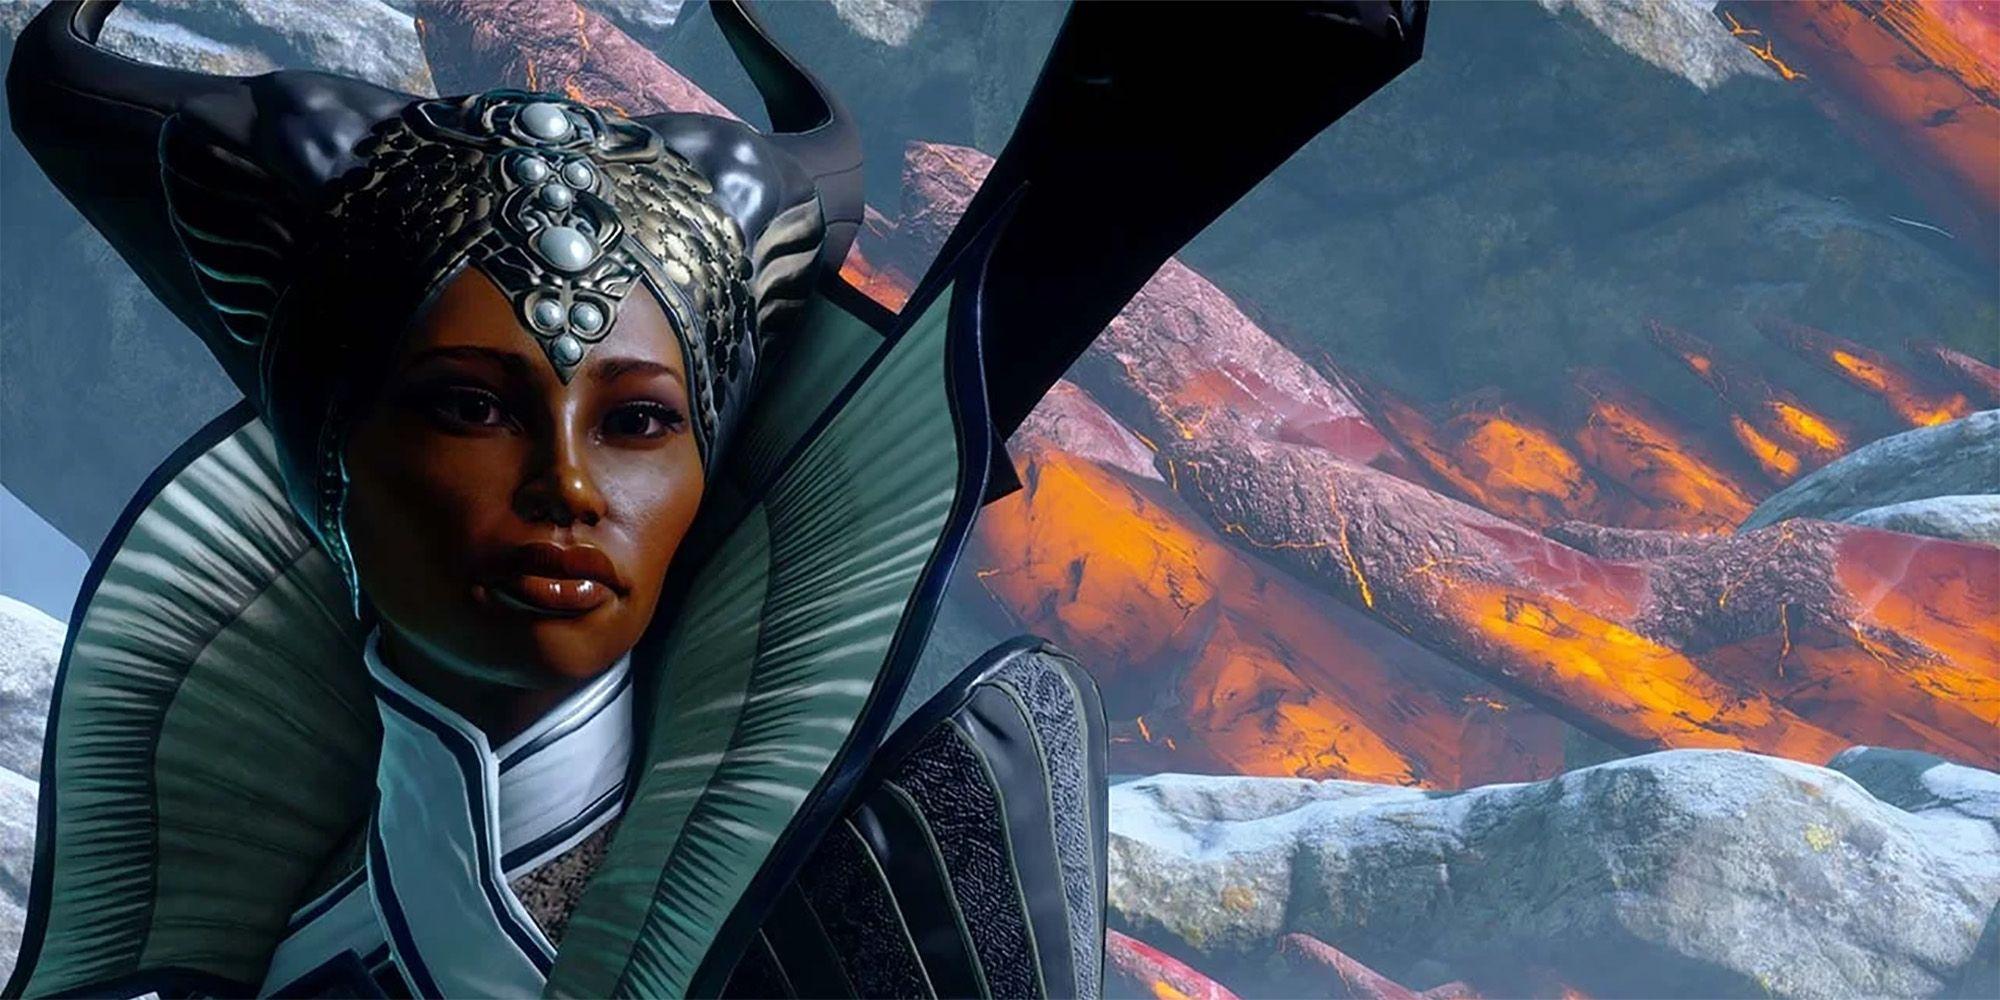 Dirthamen - God of Secrets at Dragon Age: Inquisition